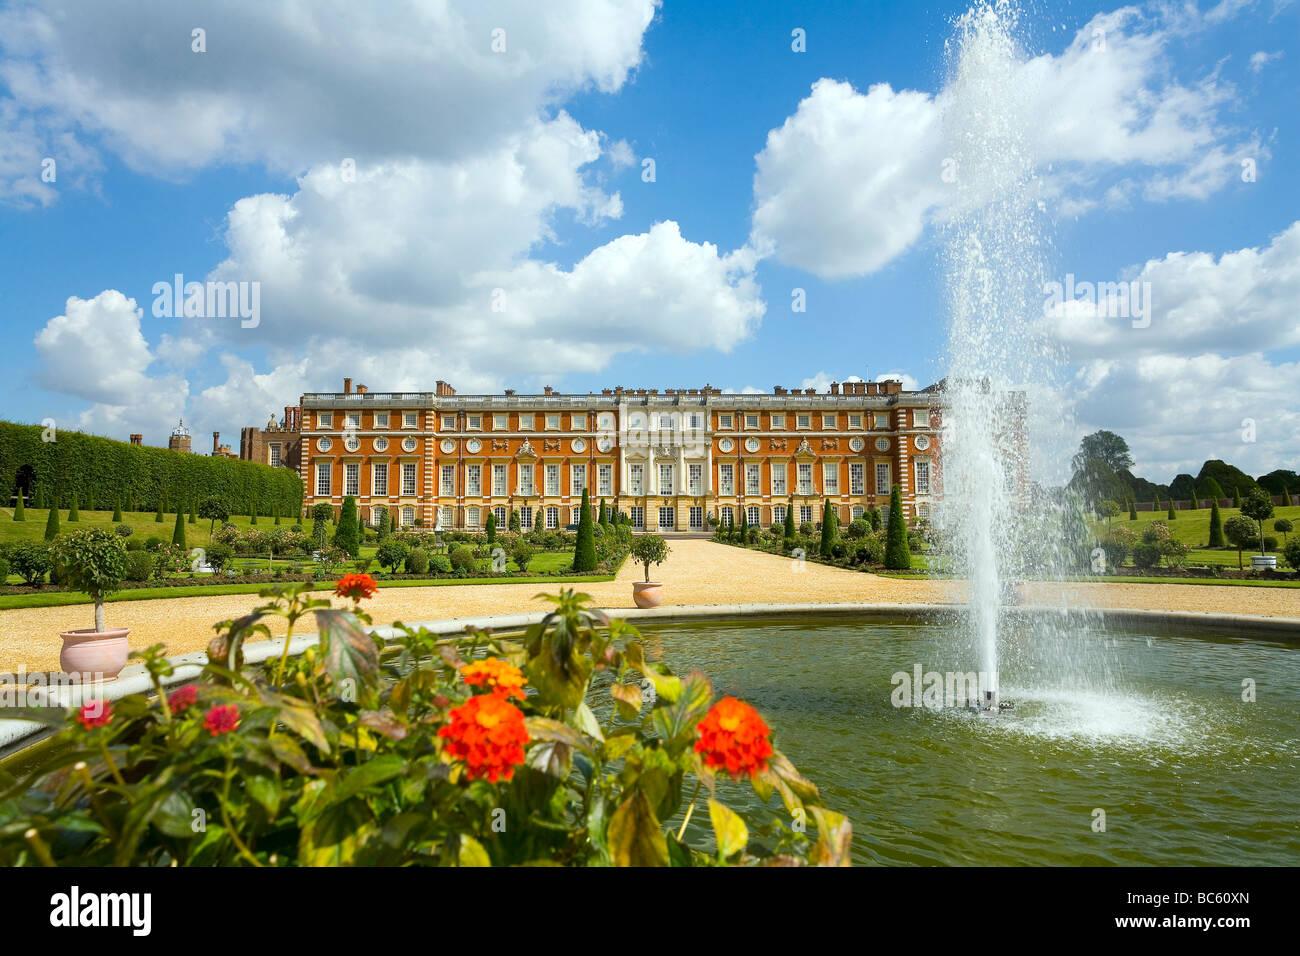 Hampton Court Palace Royal Apartments and Gardens Surrey west London - Stock Image